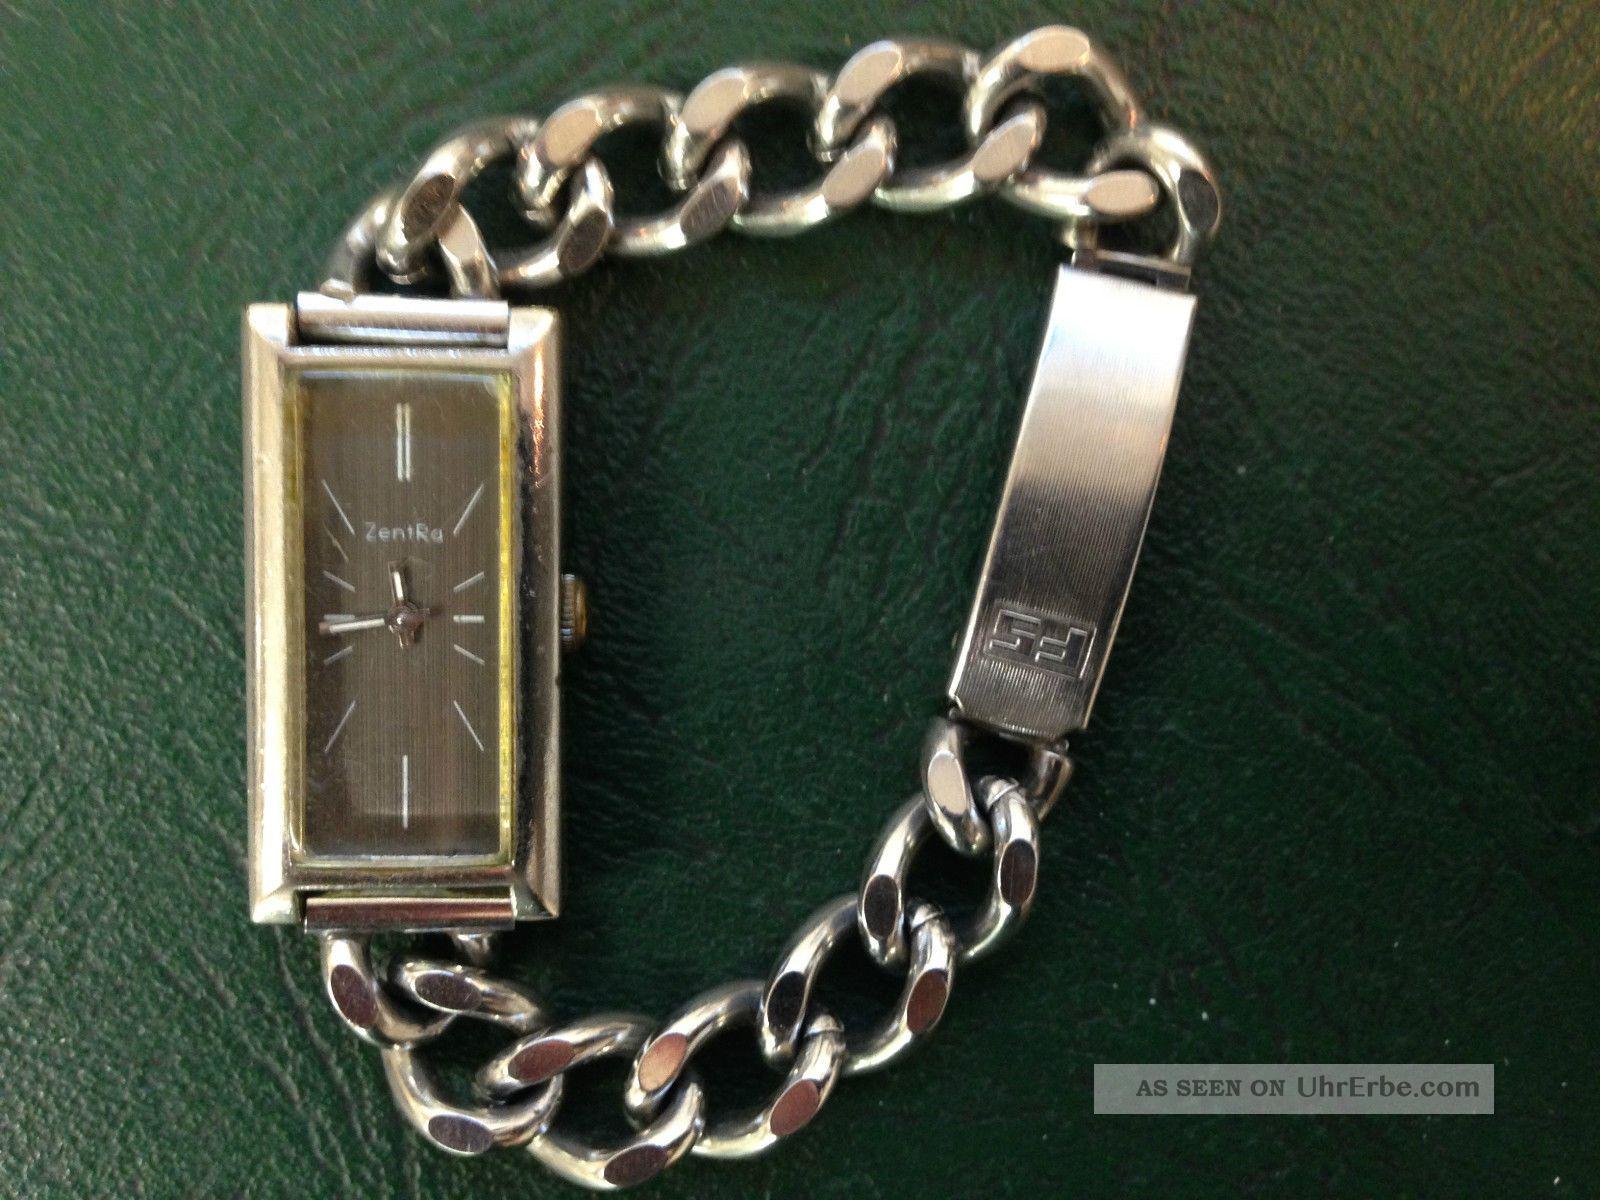 Zentra Damenuhr - Vintage Armbanduhren Bild